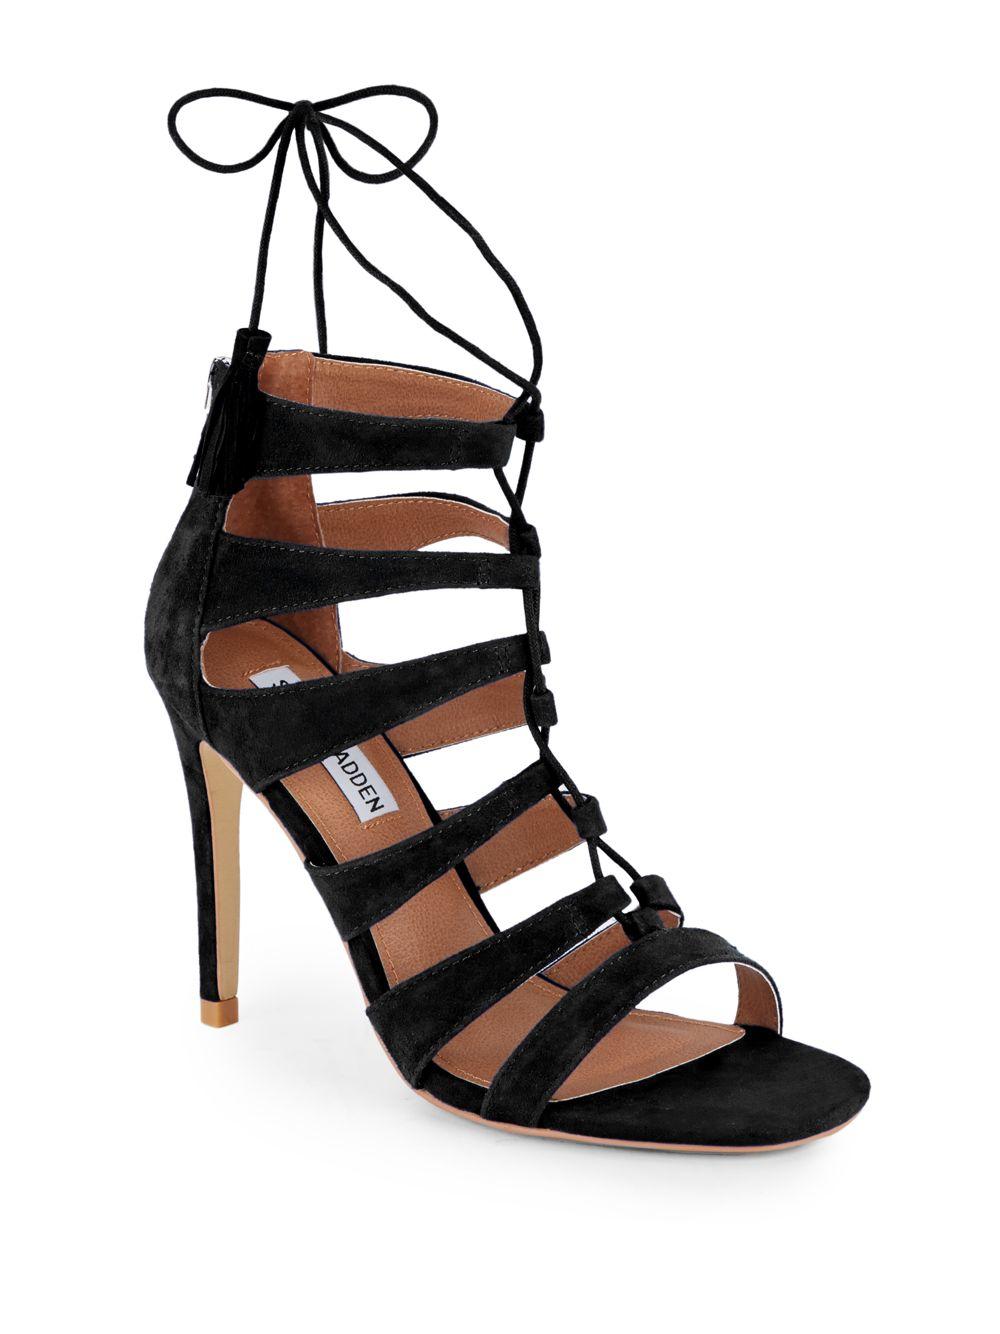 94c4e0c09cf Steve Madden Black Faraah Suede Strappy Open-toe Sandals